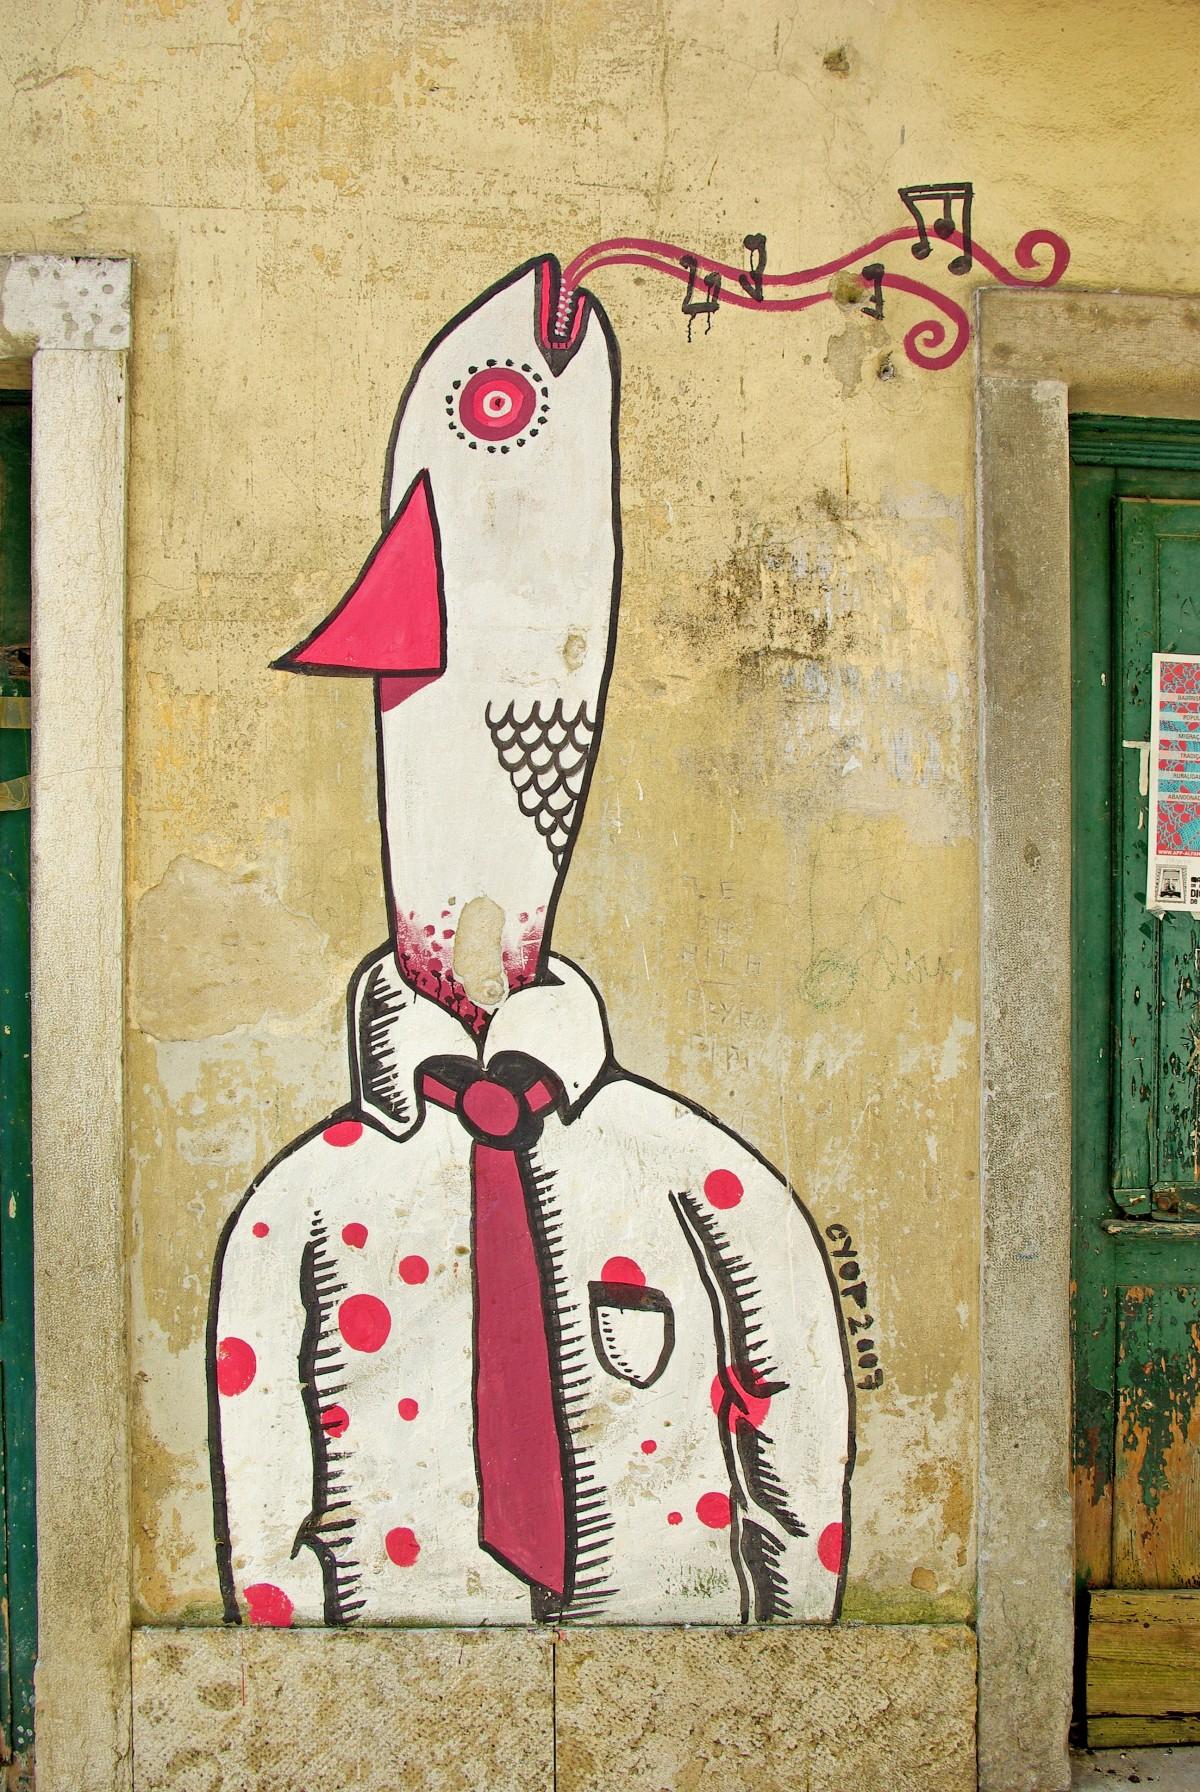 Free Images : street art, lisbon, portugal, graffiti, mural, wall ...